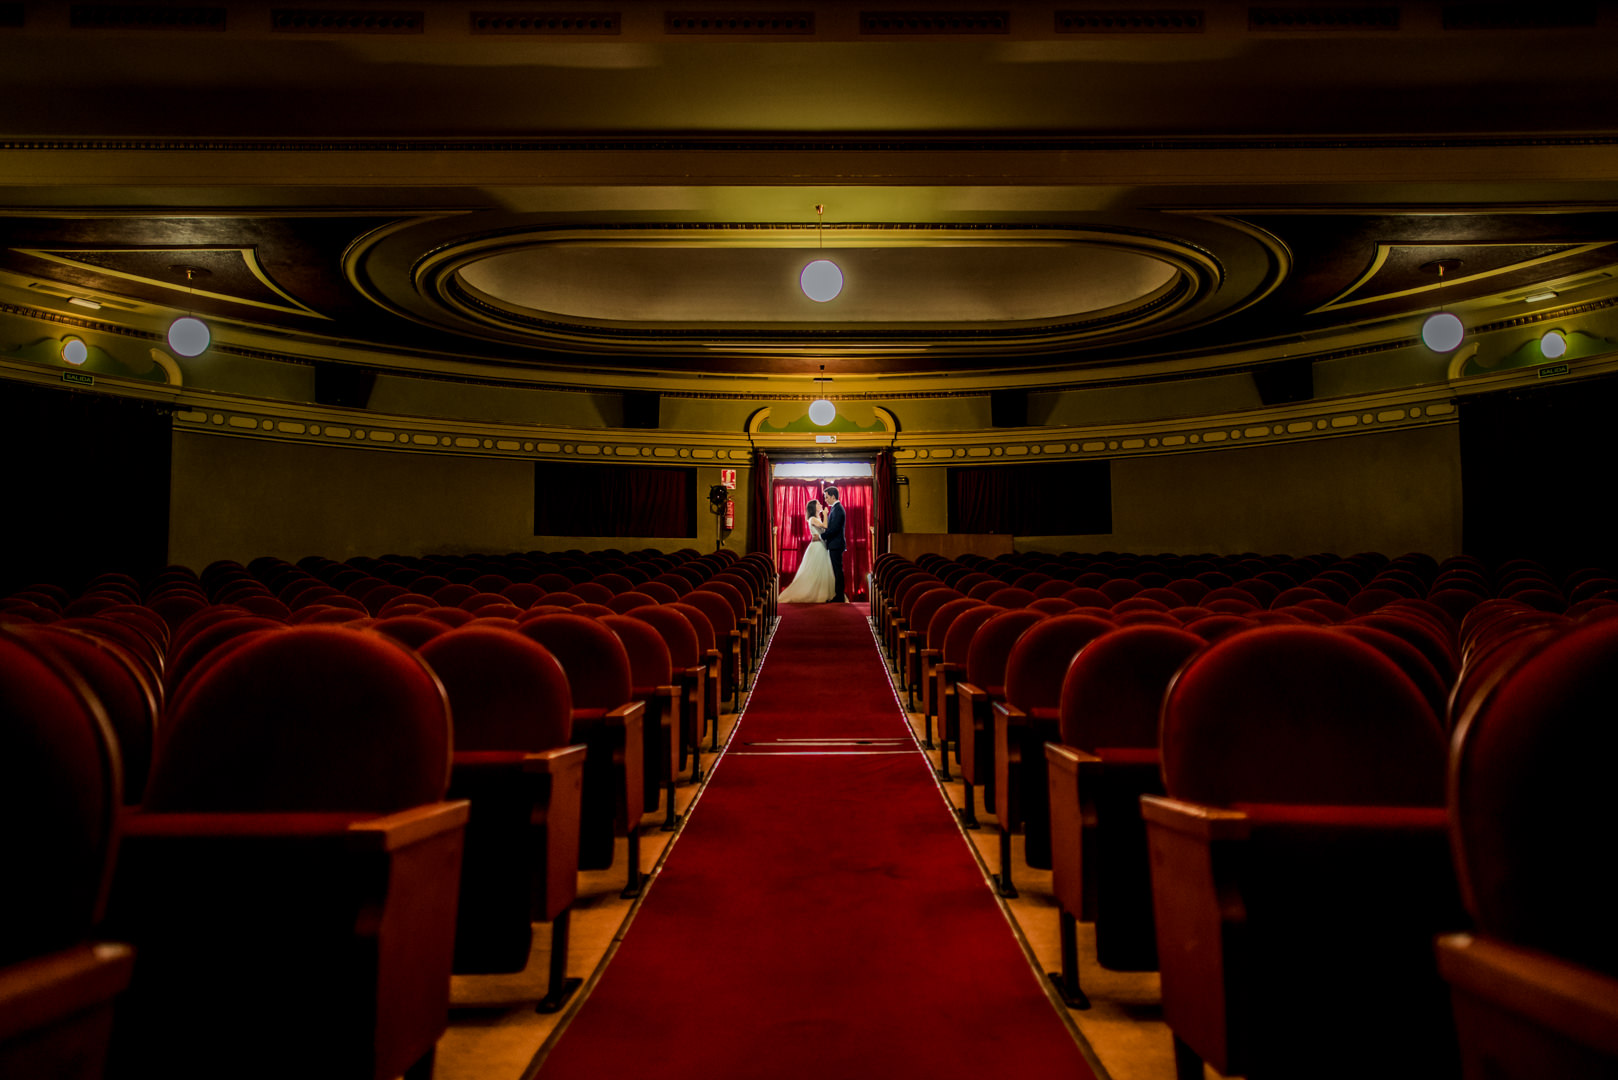 Postboda-Teatro-Cerezo-Carmona-engagement-Rafael-Torres-fotografo-bodas-sevilla-madrid-barcelona-wedding-photographer--2.jpg